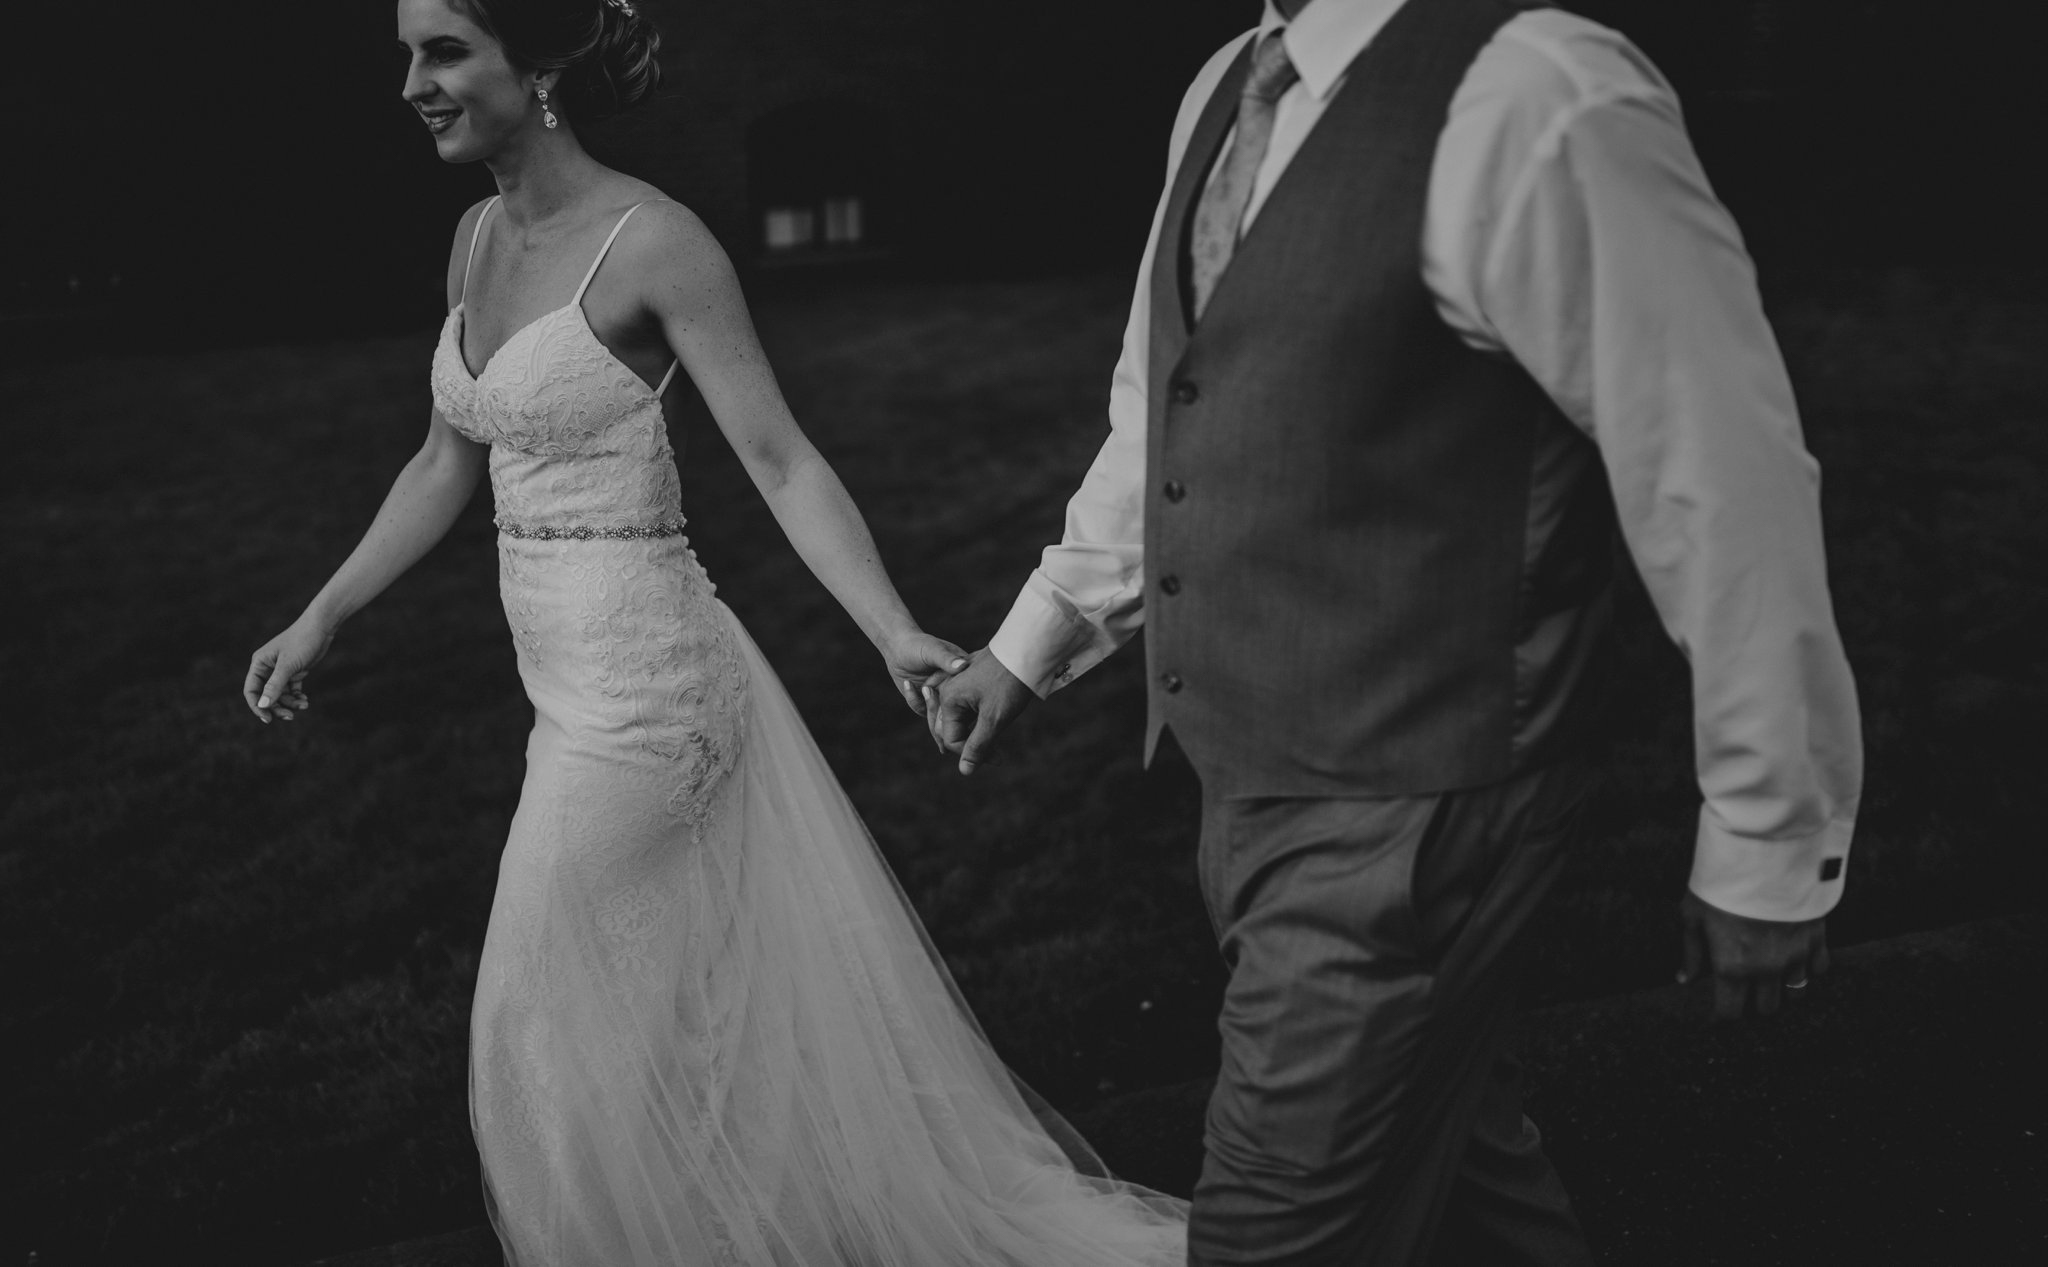 hollywood-school-house-wedding-seattle-photographer-caitlyn-nikula-109.jpg